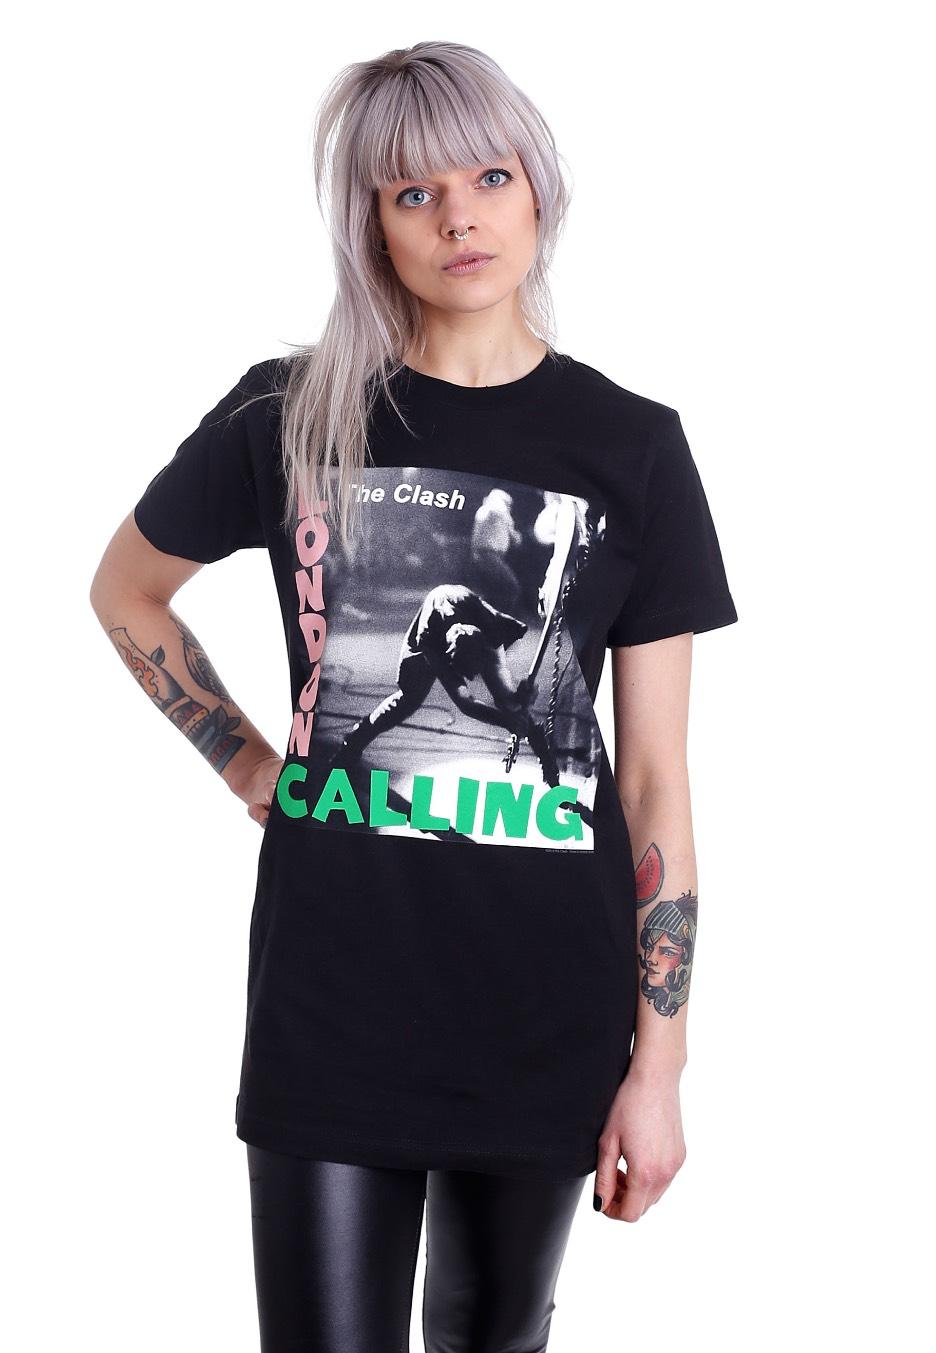 The Clash London Calling T-Shirt